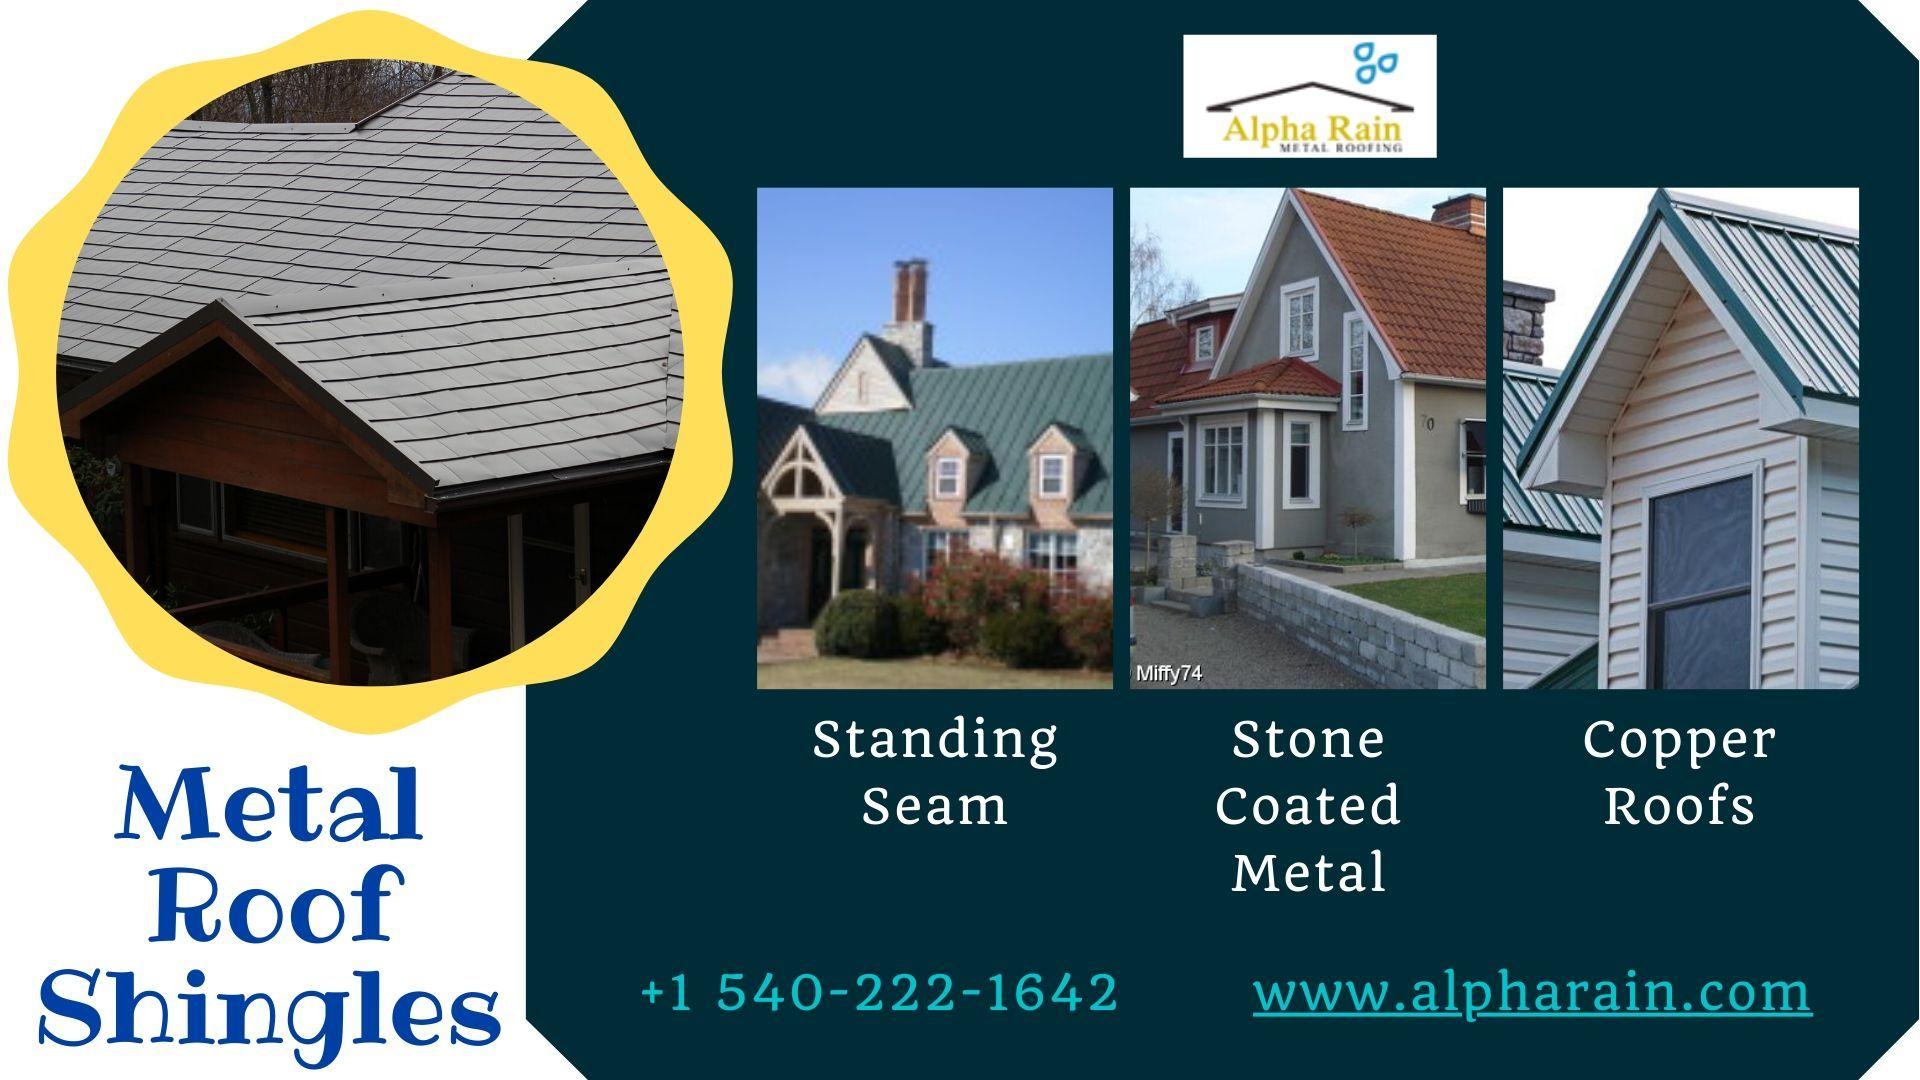 Virginia Metal Roof Specialists In 2020 Metal Roof Metal Shingle Roof Metal Shingles